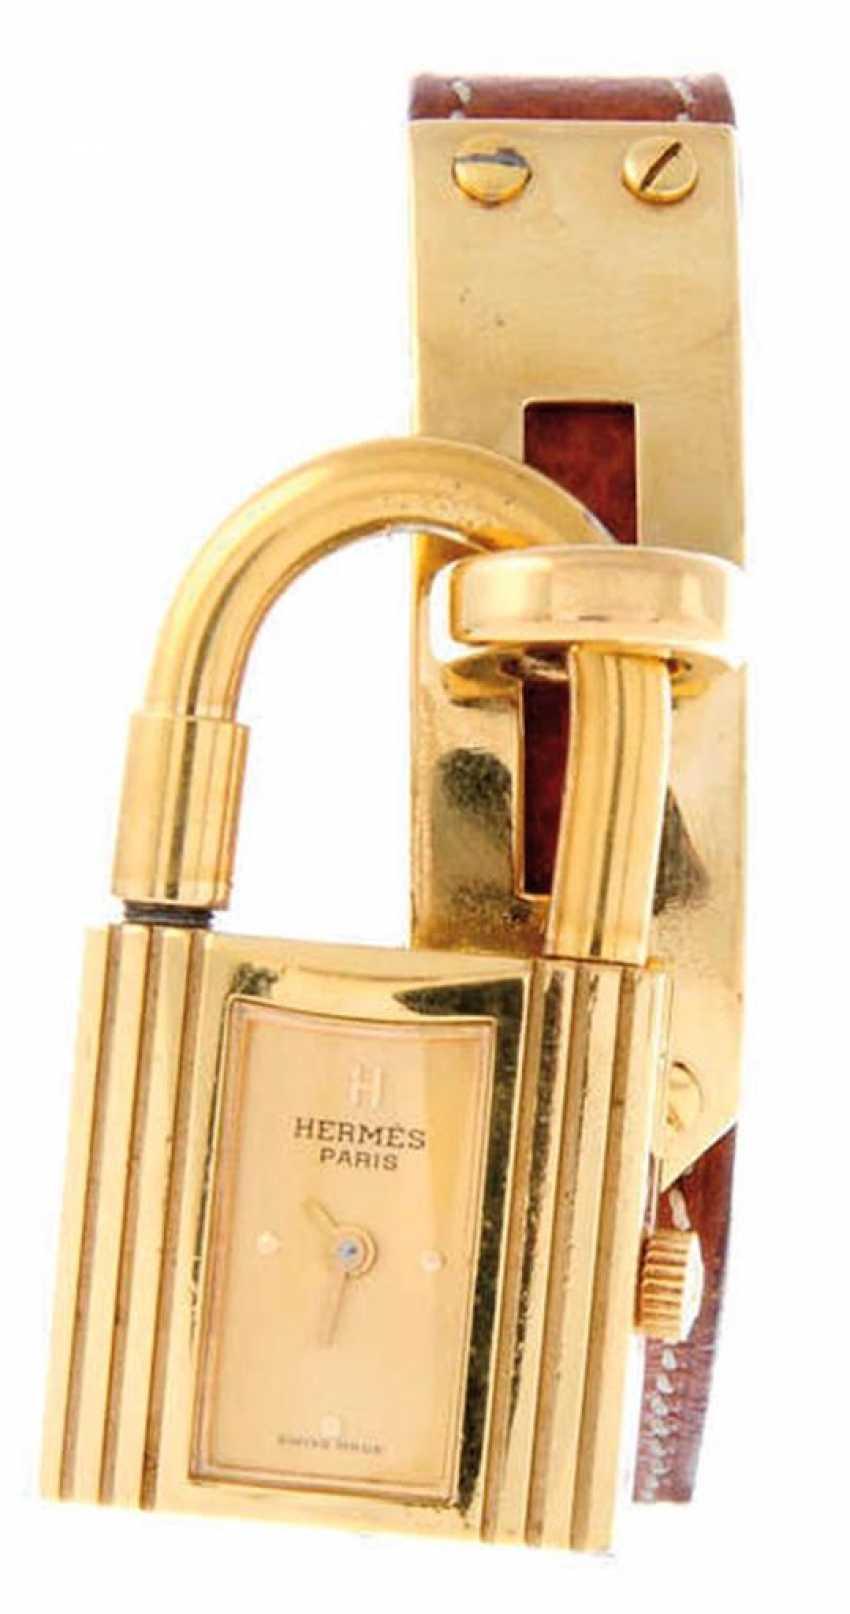 Hermès Damenarmbanduhr - photo 1